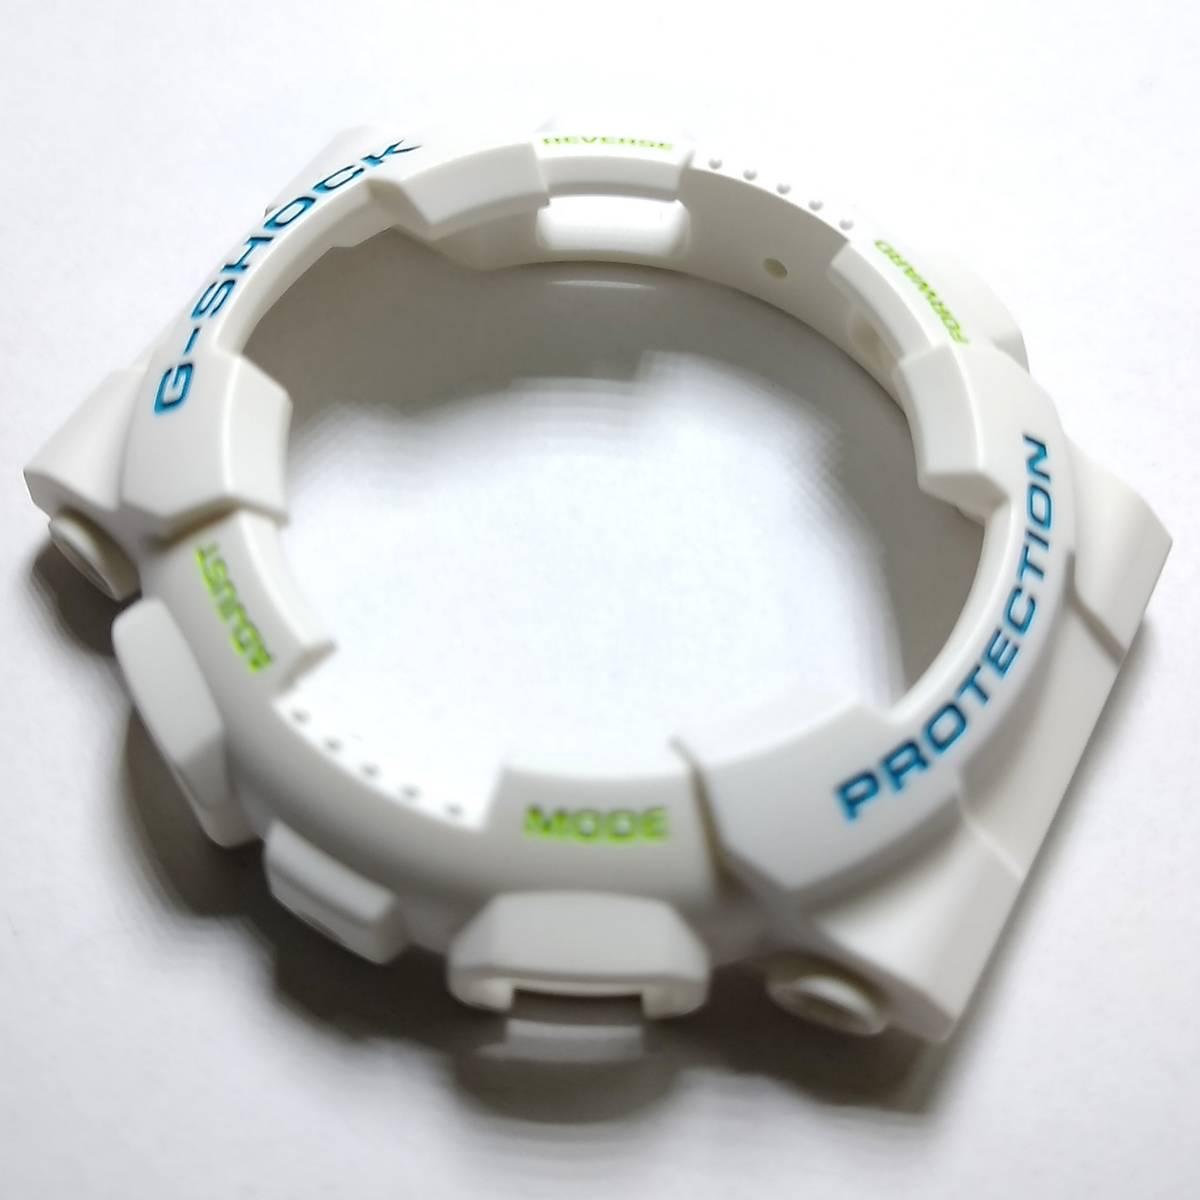 Bezel Casio G-Shock Branco Fosco GA-110WG-7A *  - E-Presentes